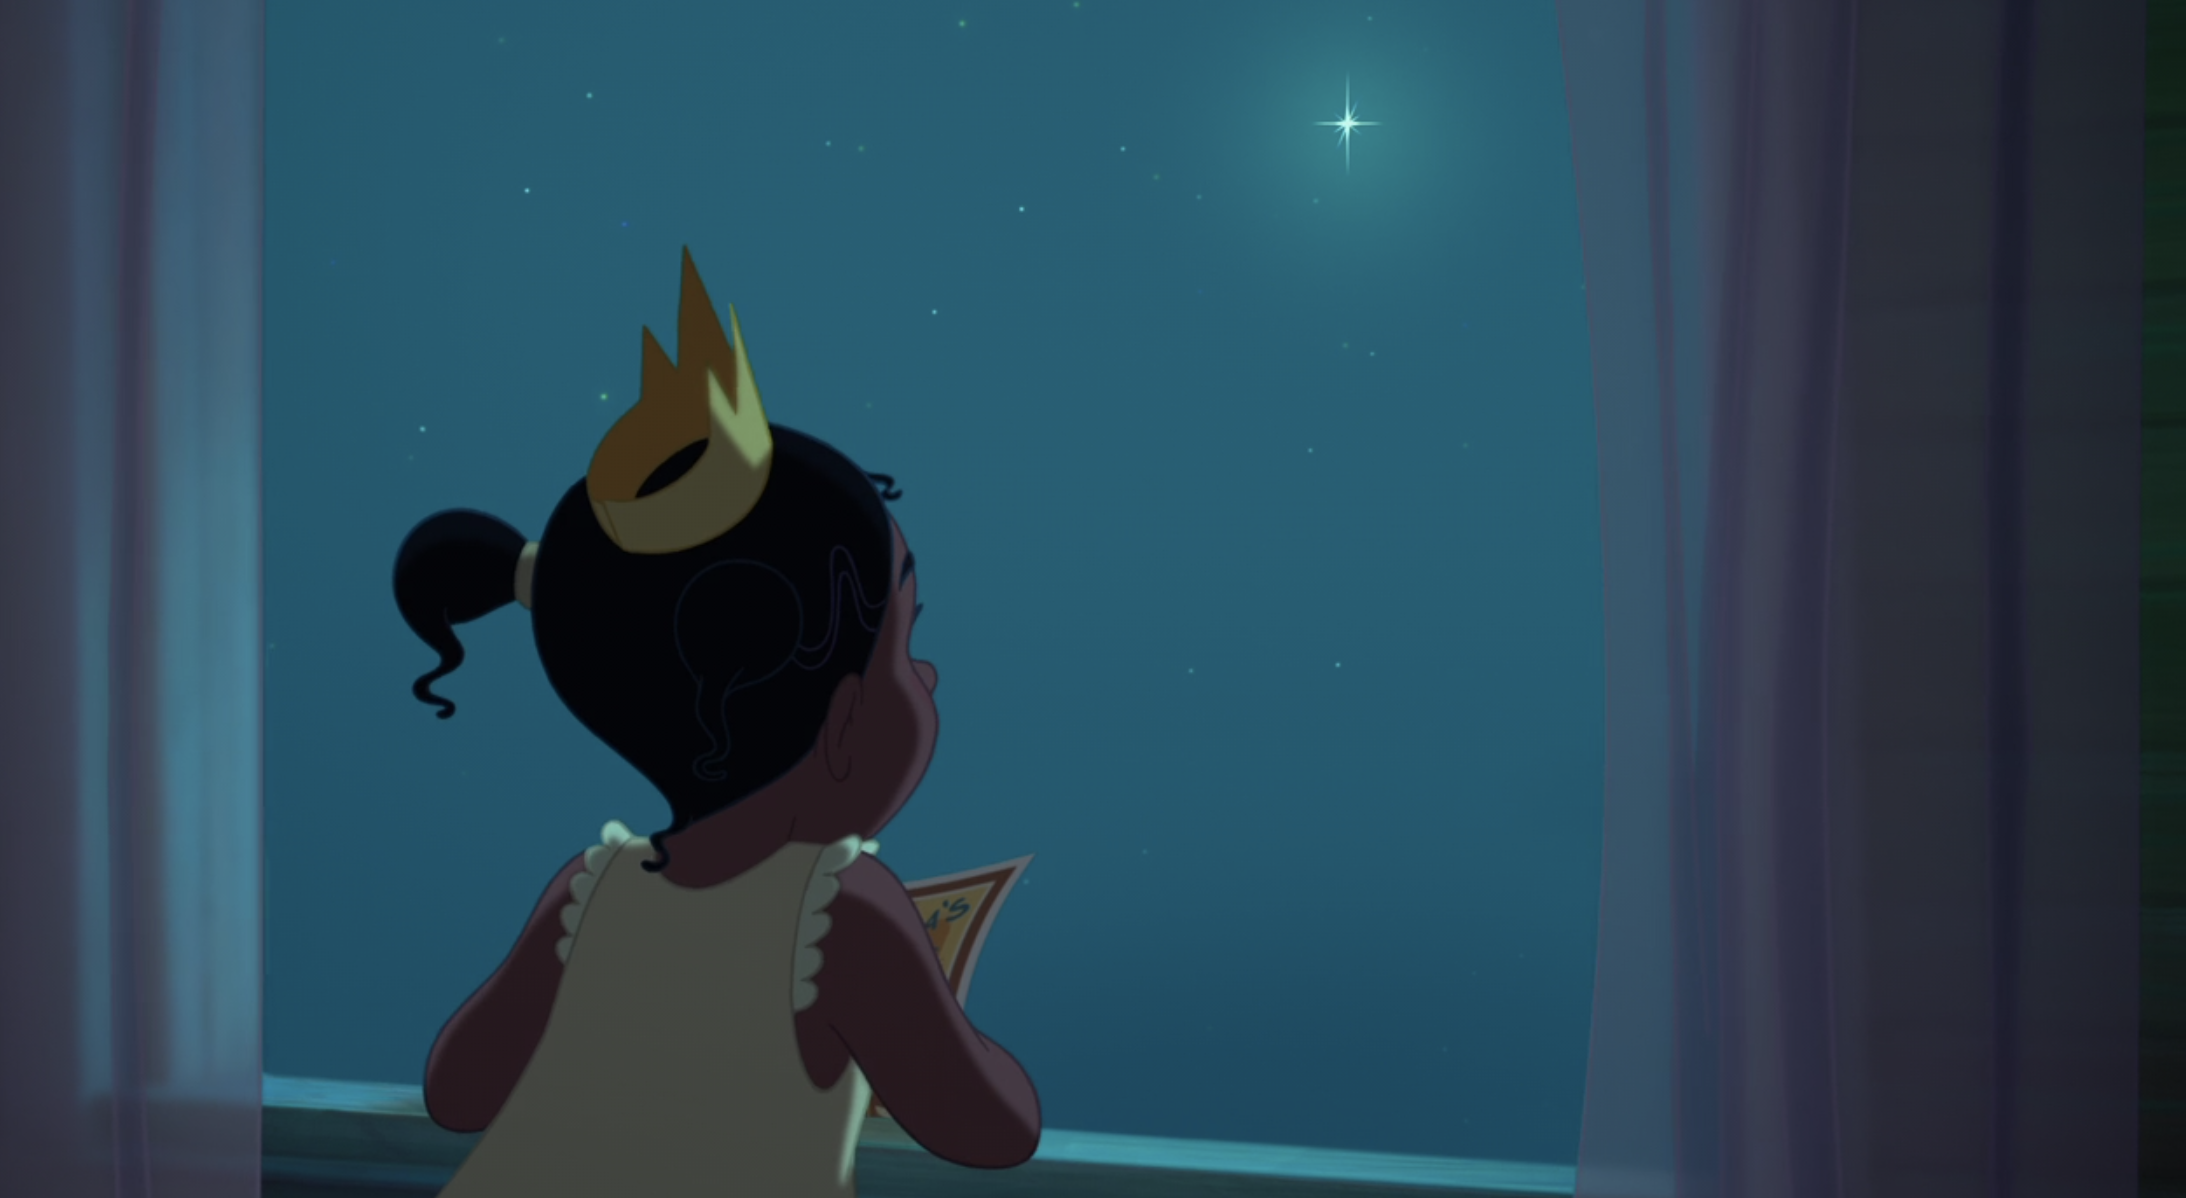 Tiana wishing on a star